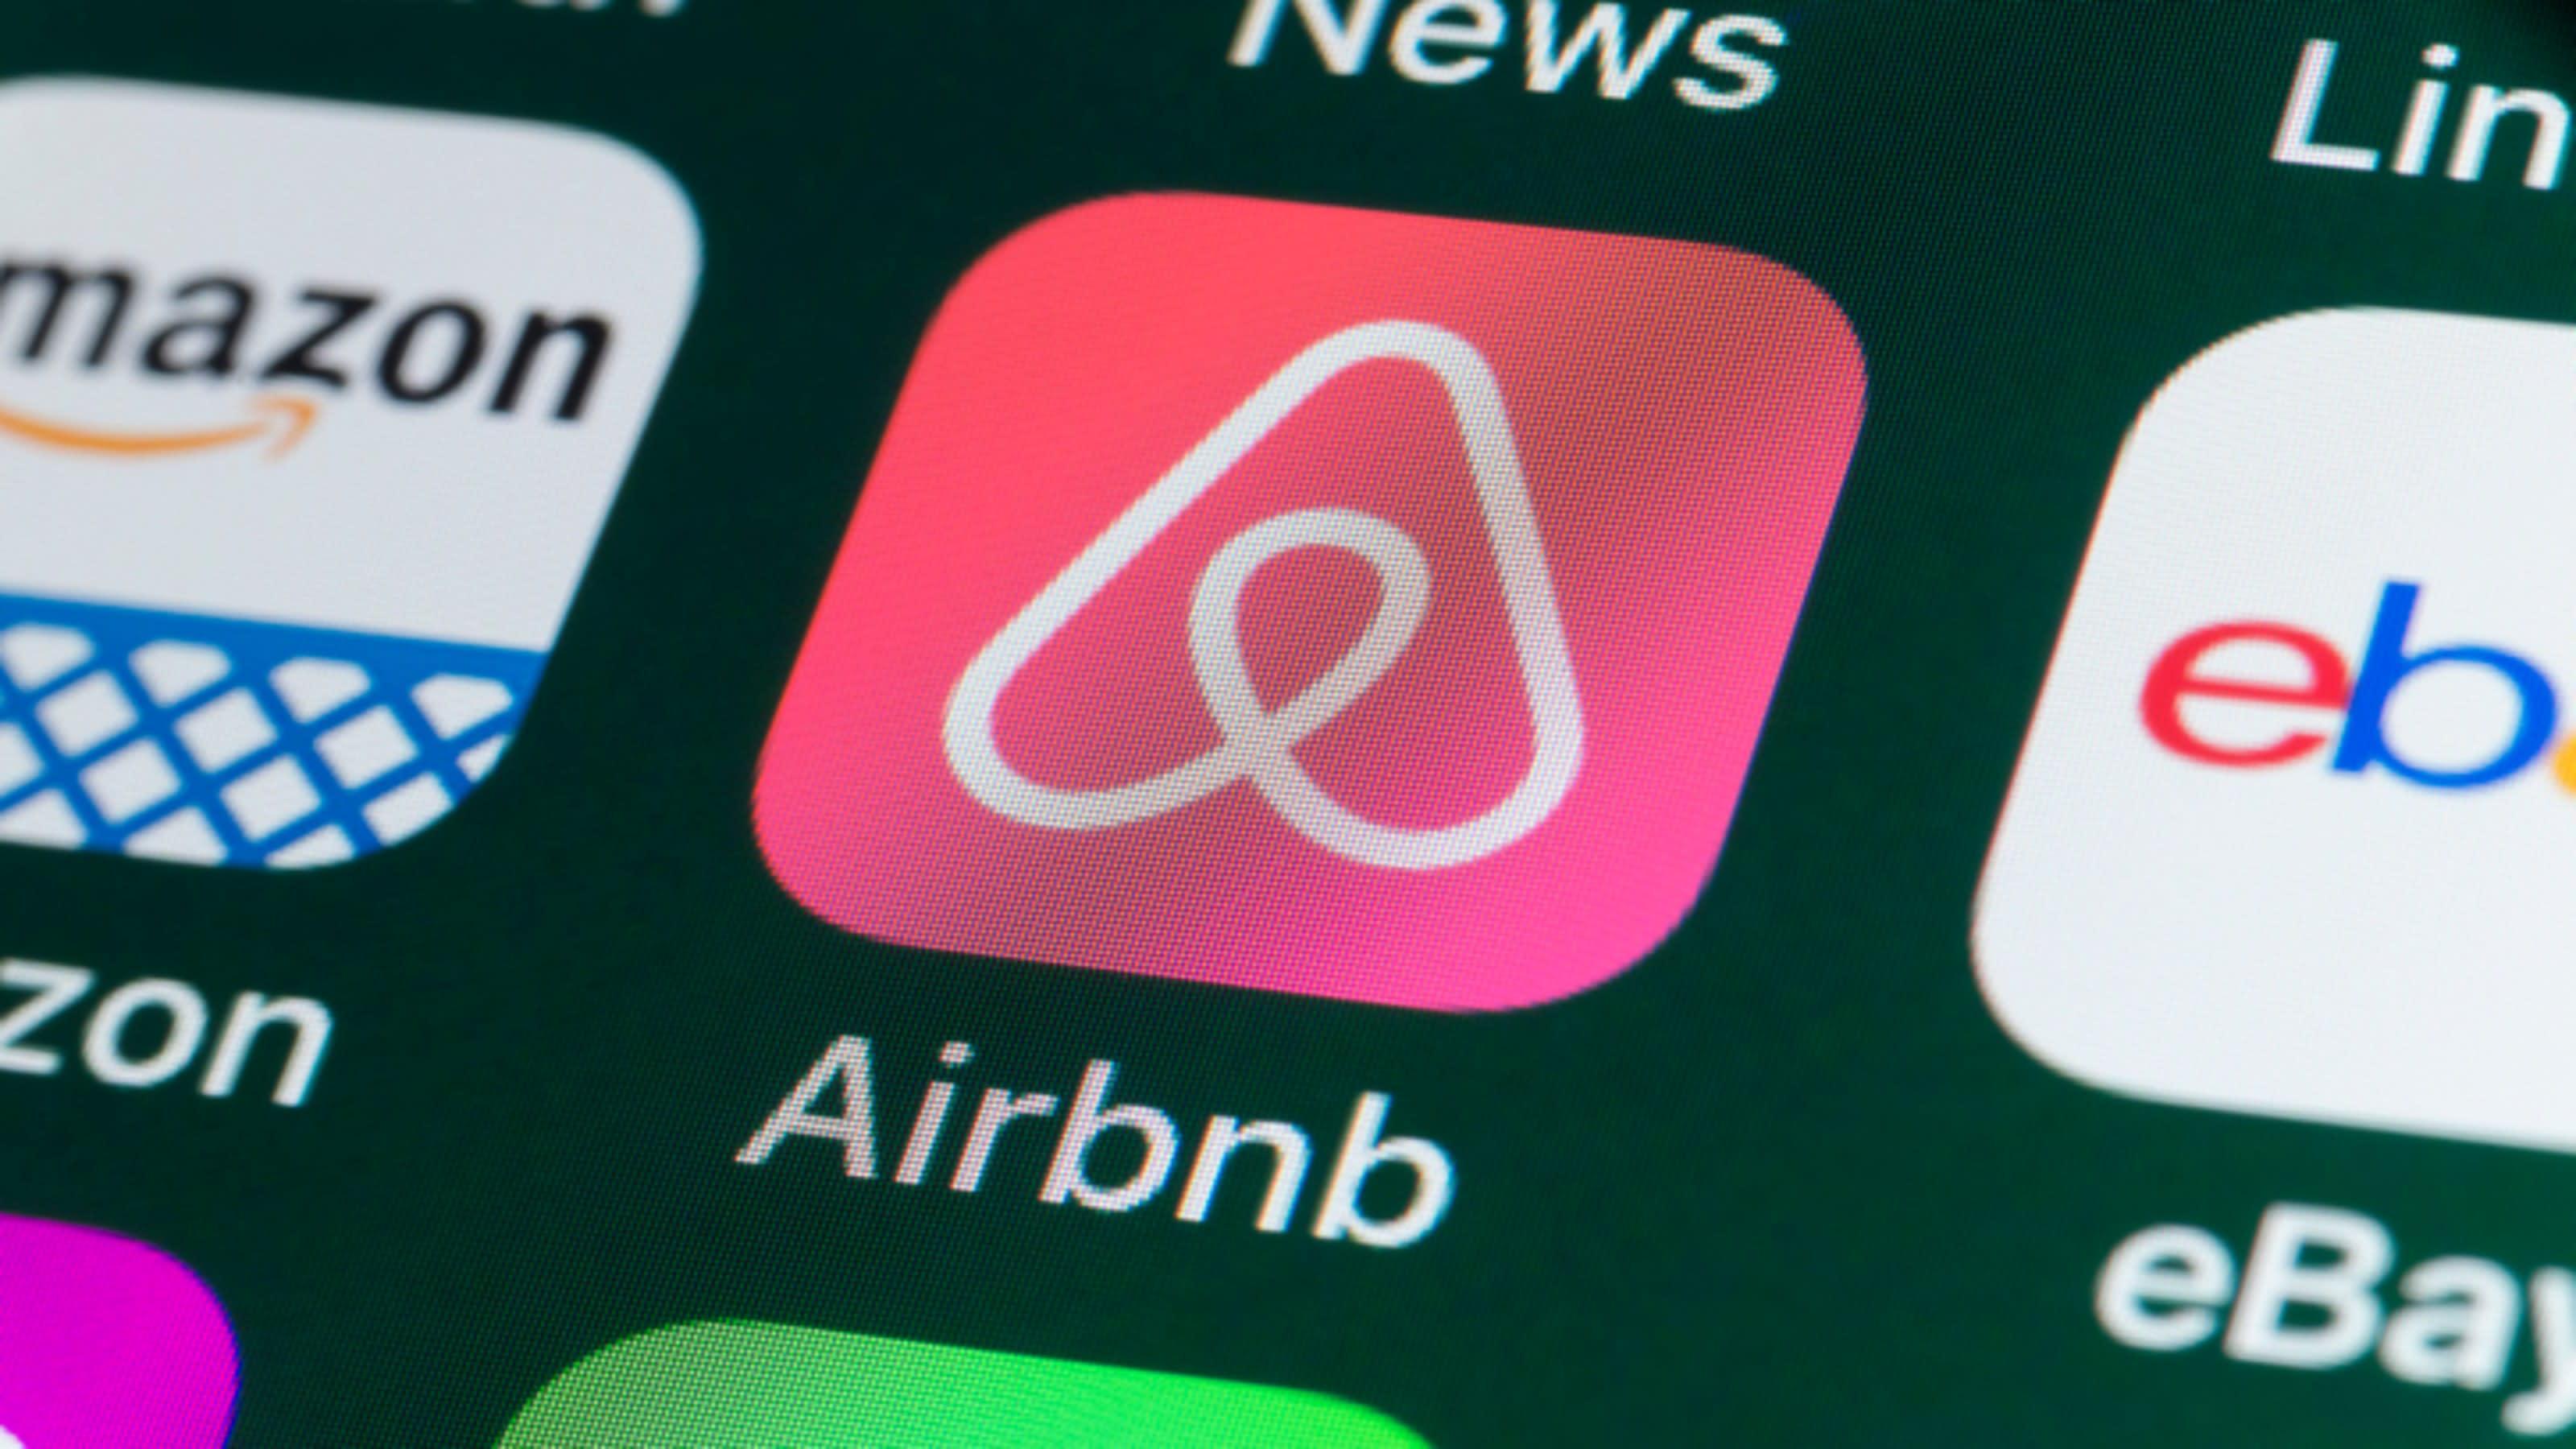 Airbnb IPO: Halal? A Good Buy?